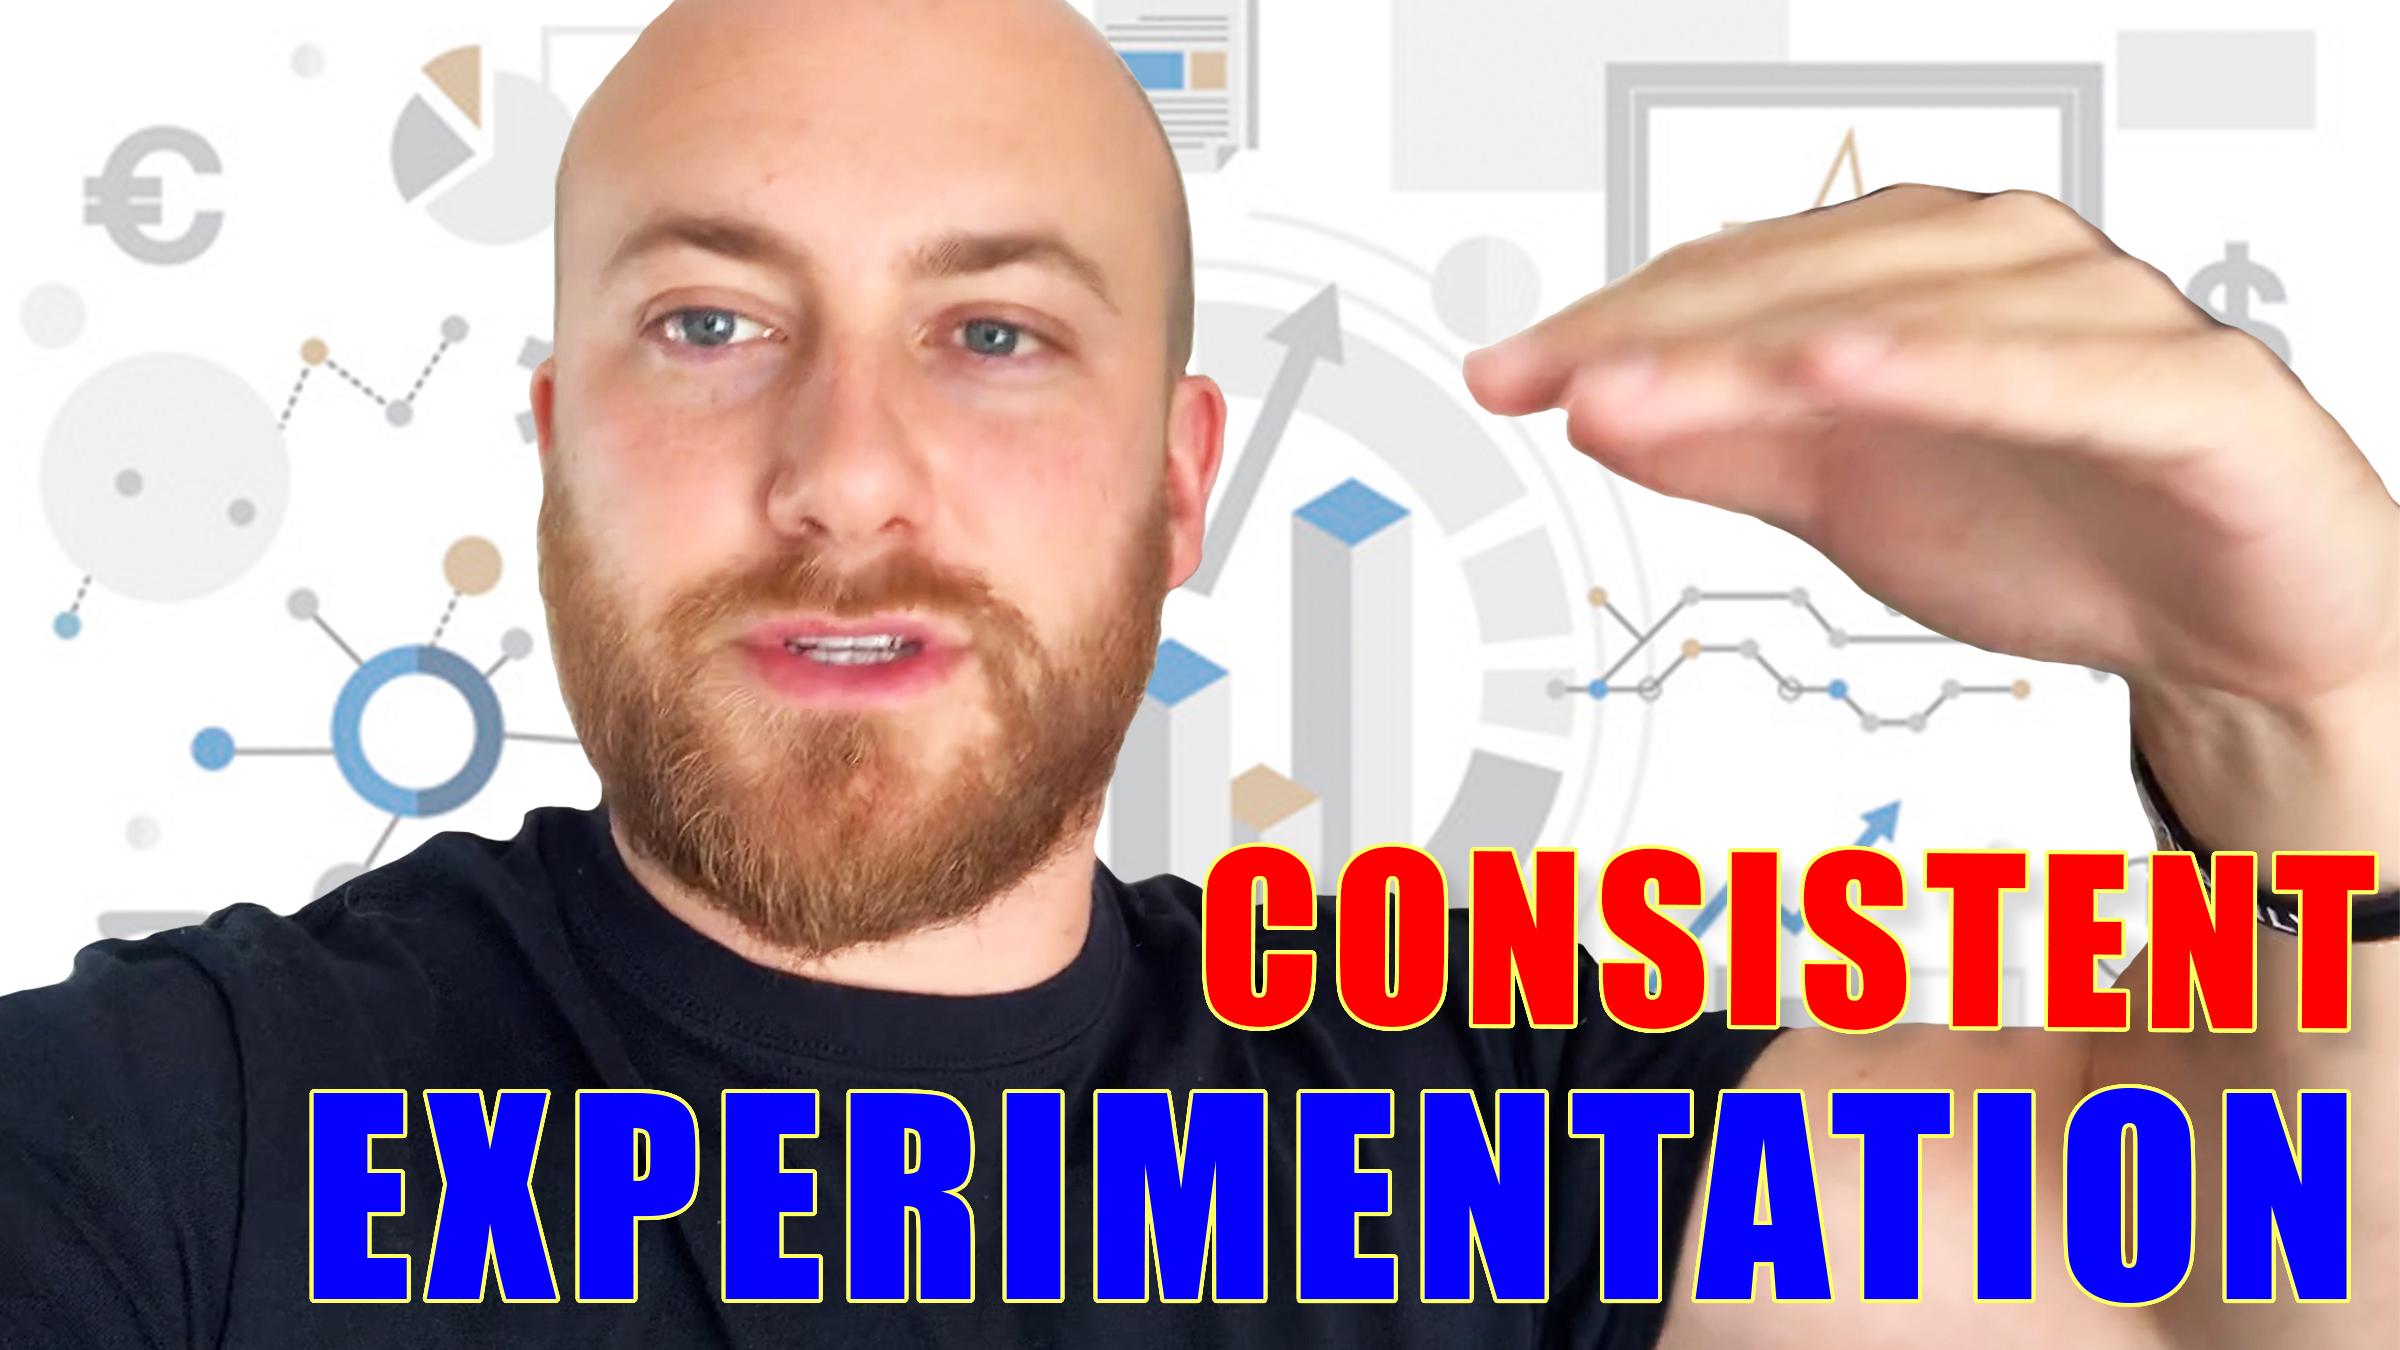 Consistent Experimentation